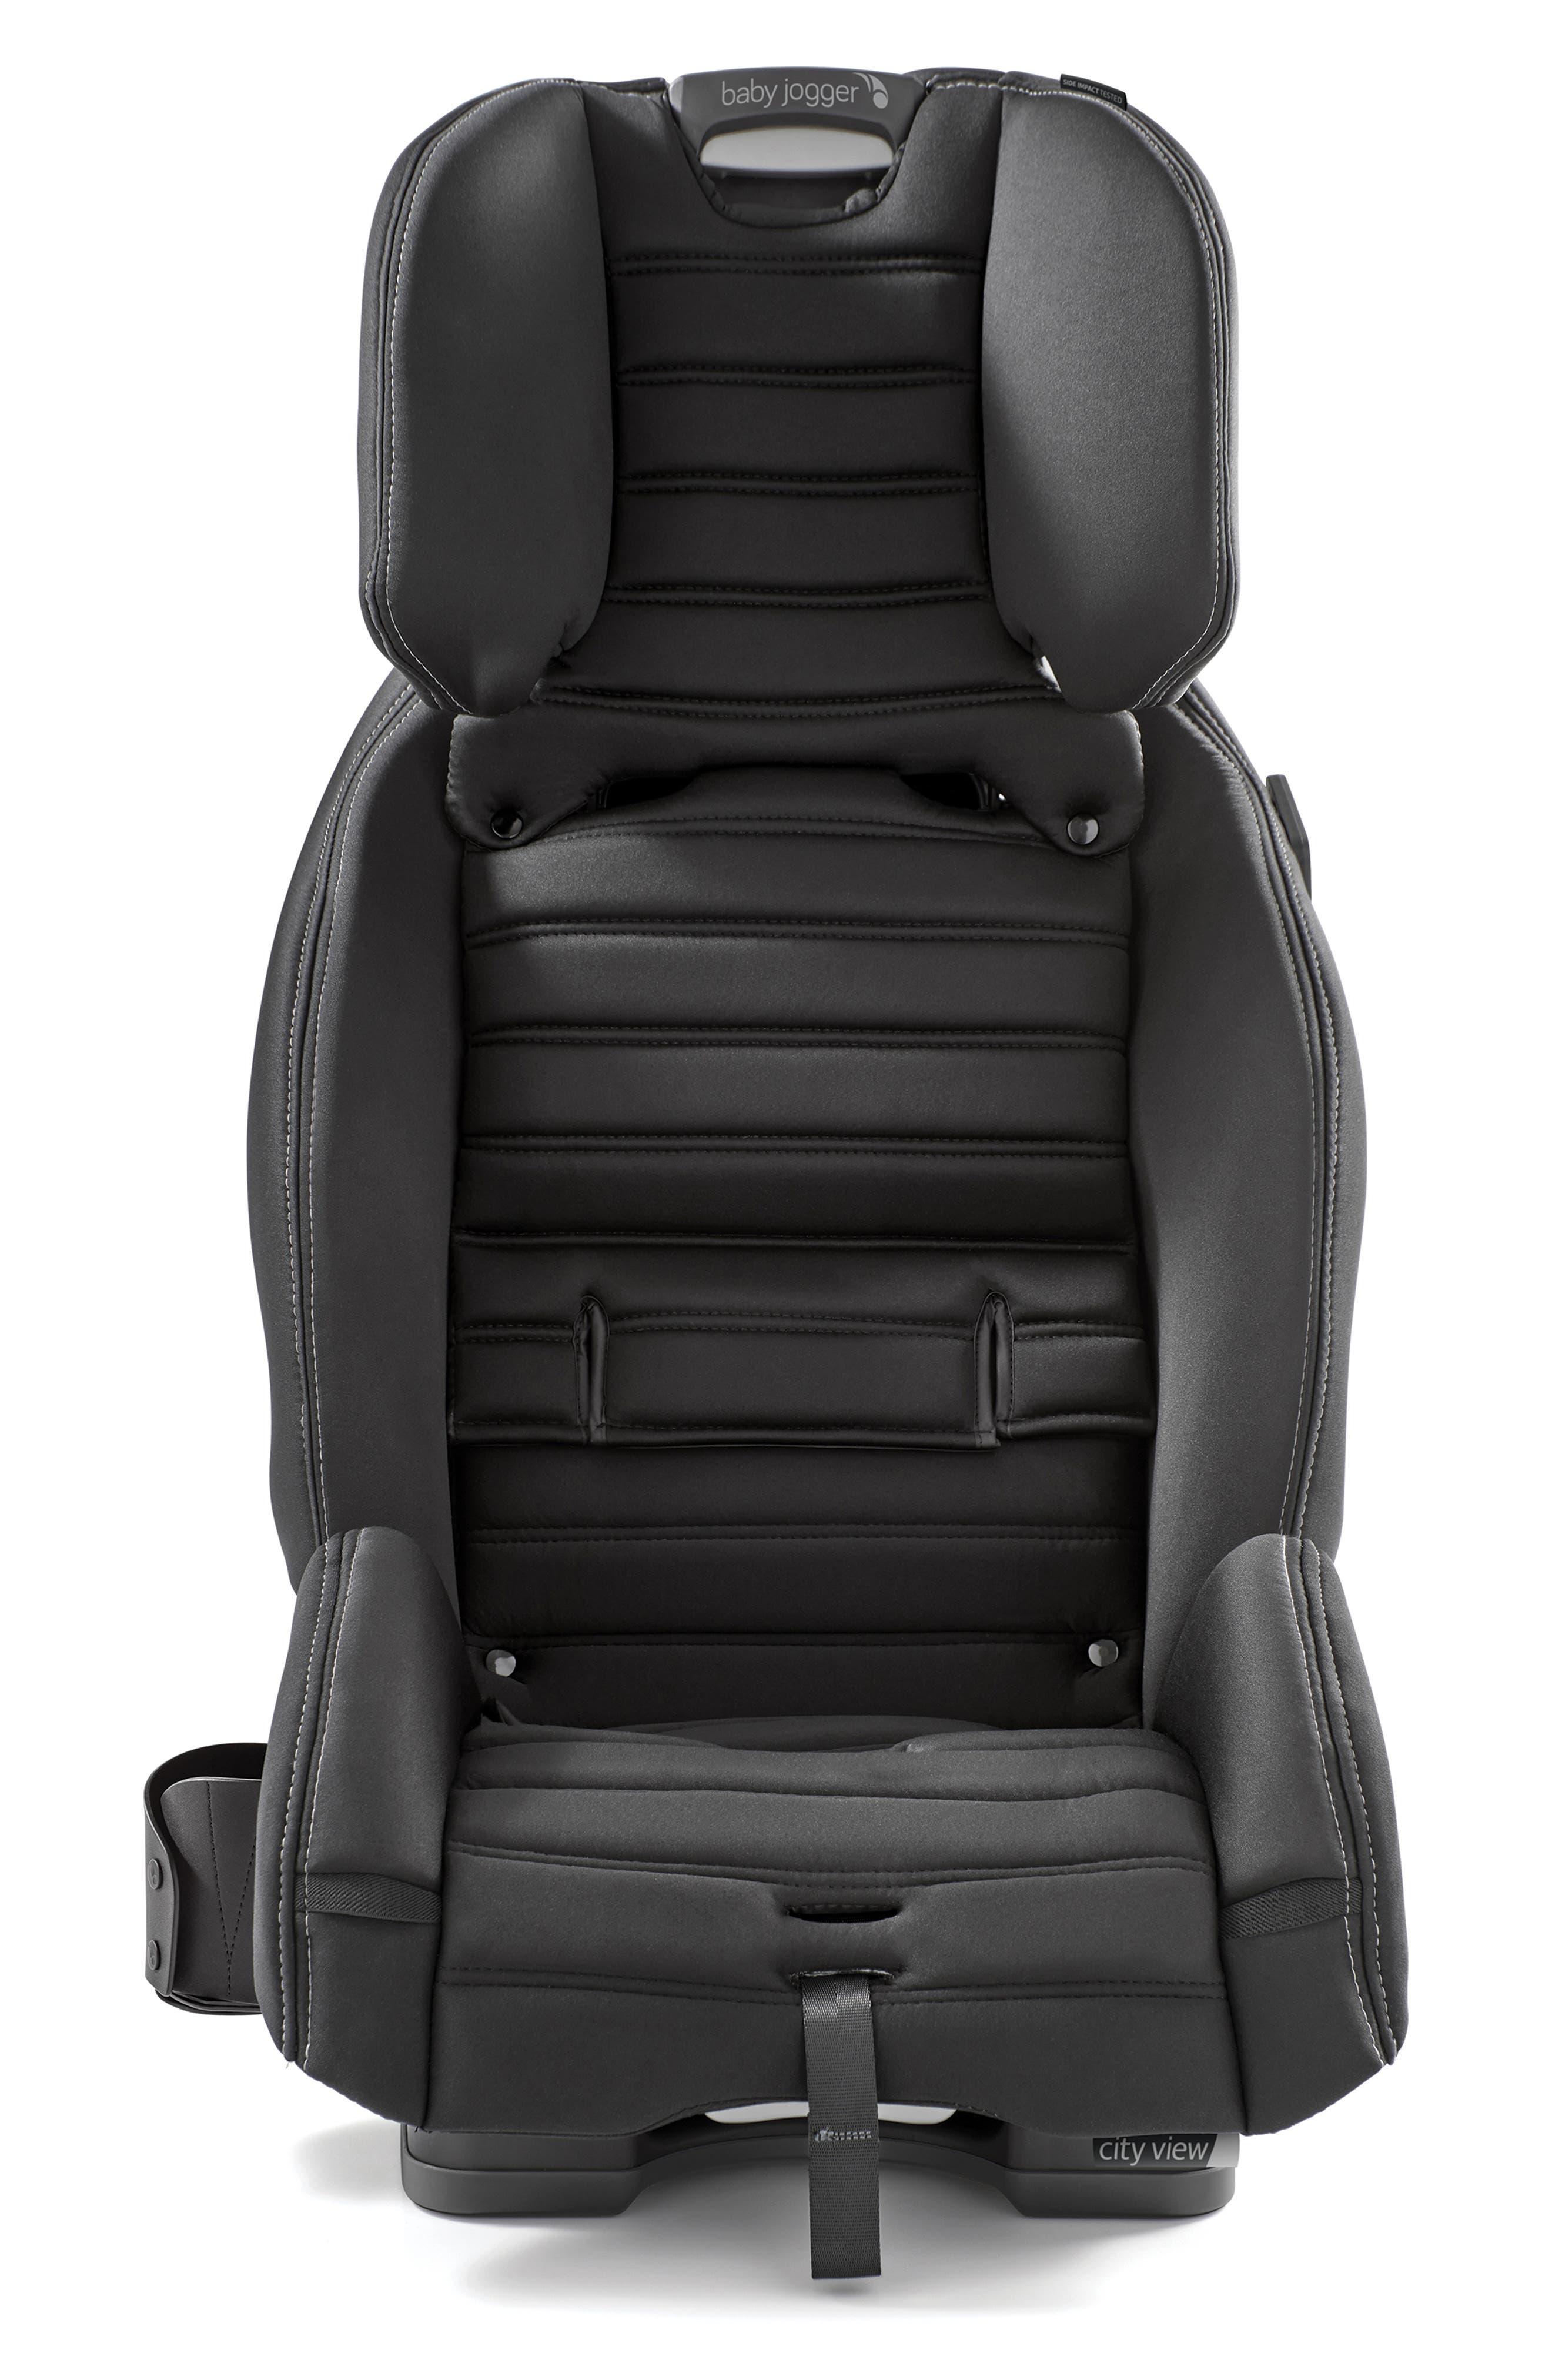 City View 2018 Convertible Car Seat,                             Alternate thumbnail 6, color,                             BLACK/ MONUMENT